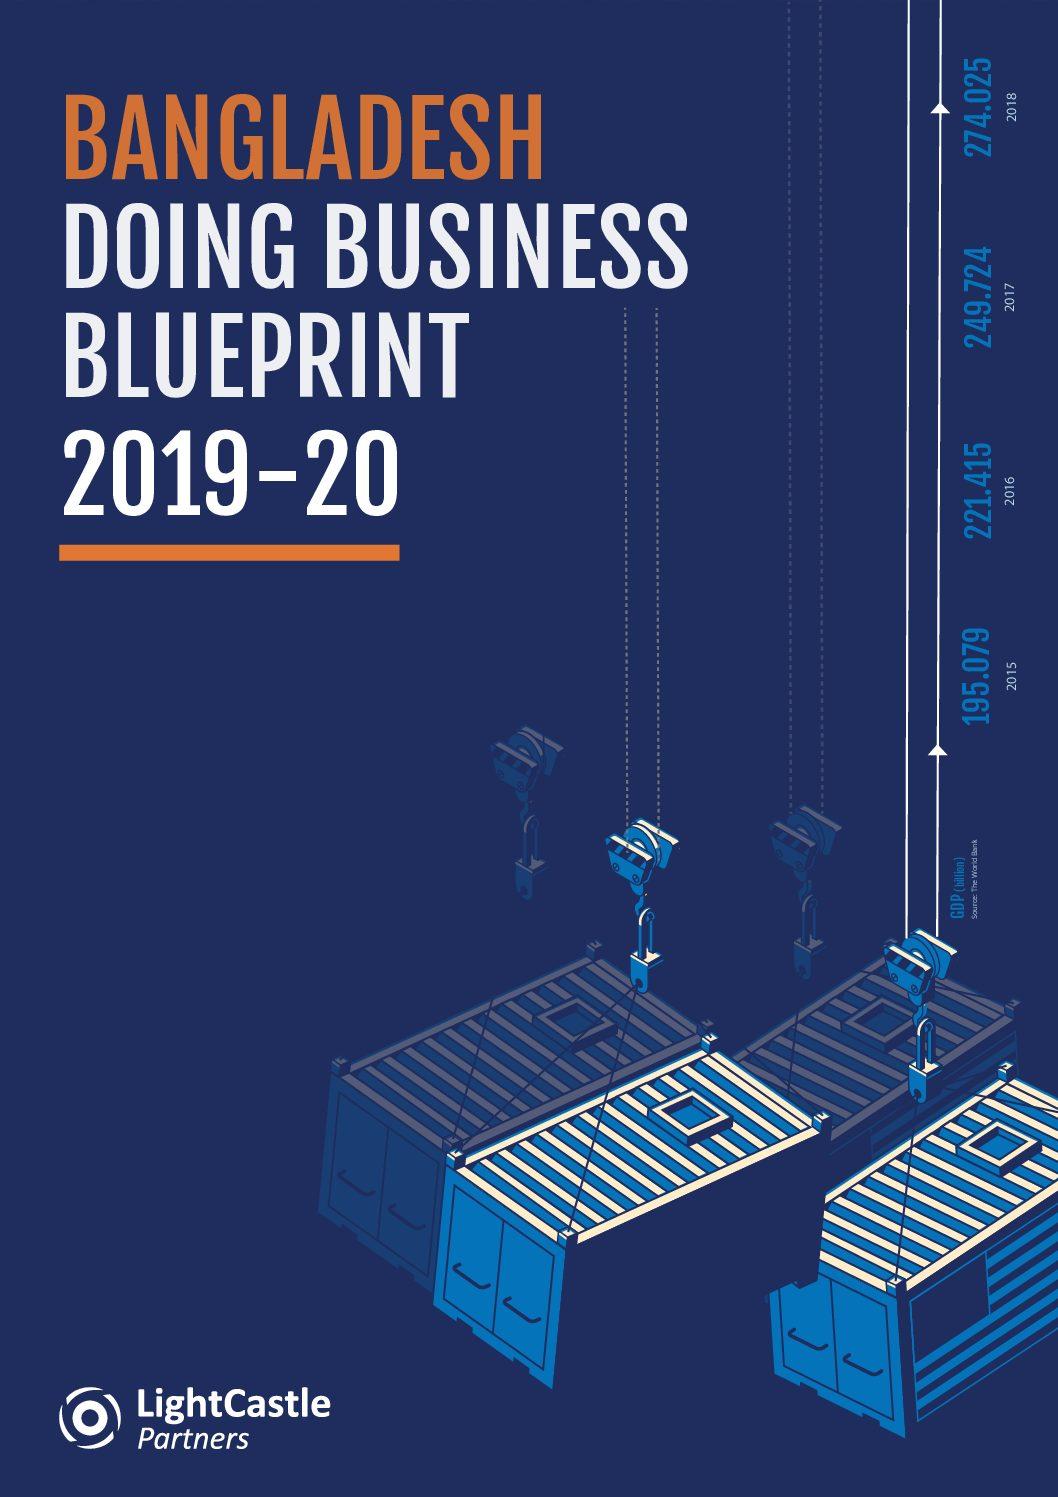 Bangladesh Doing Business Blueprint 2019-20